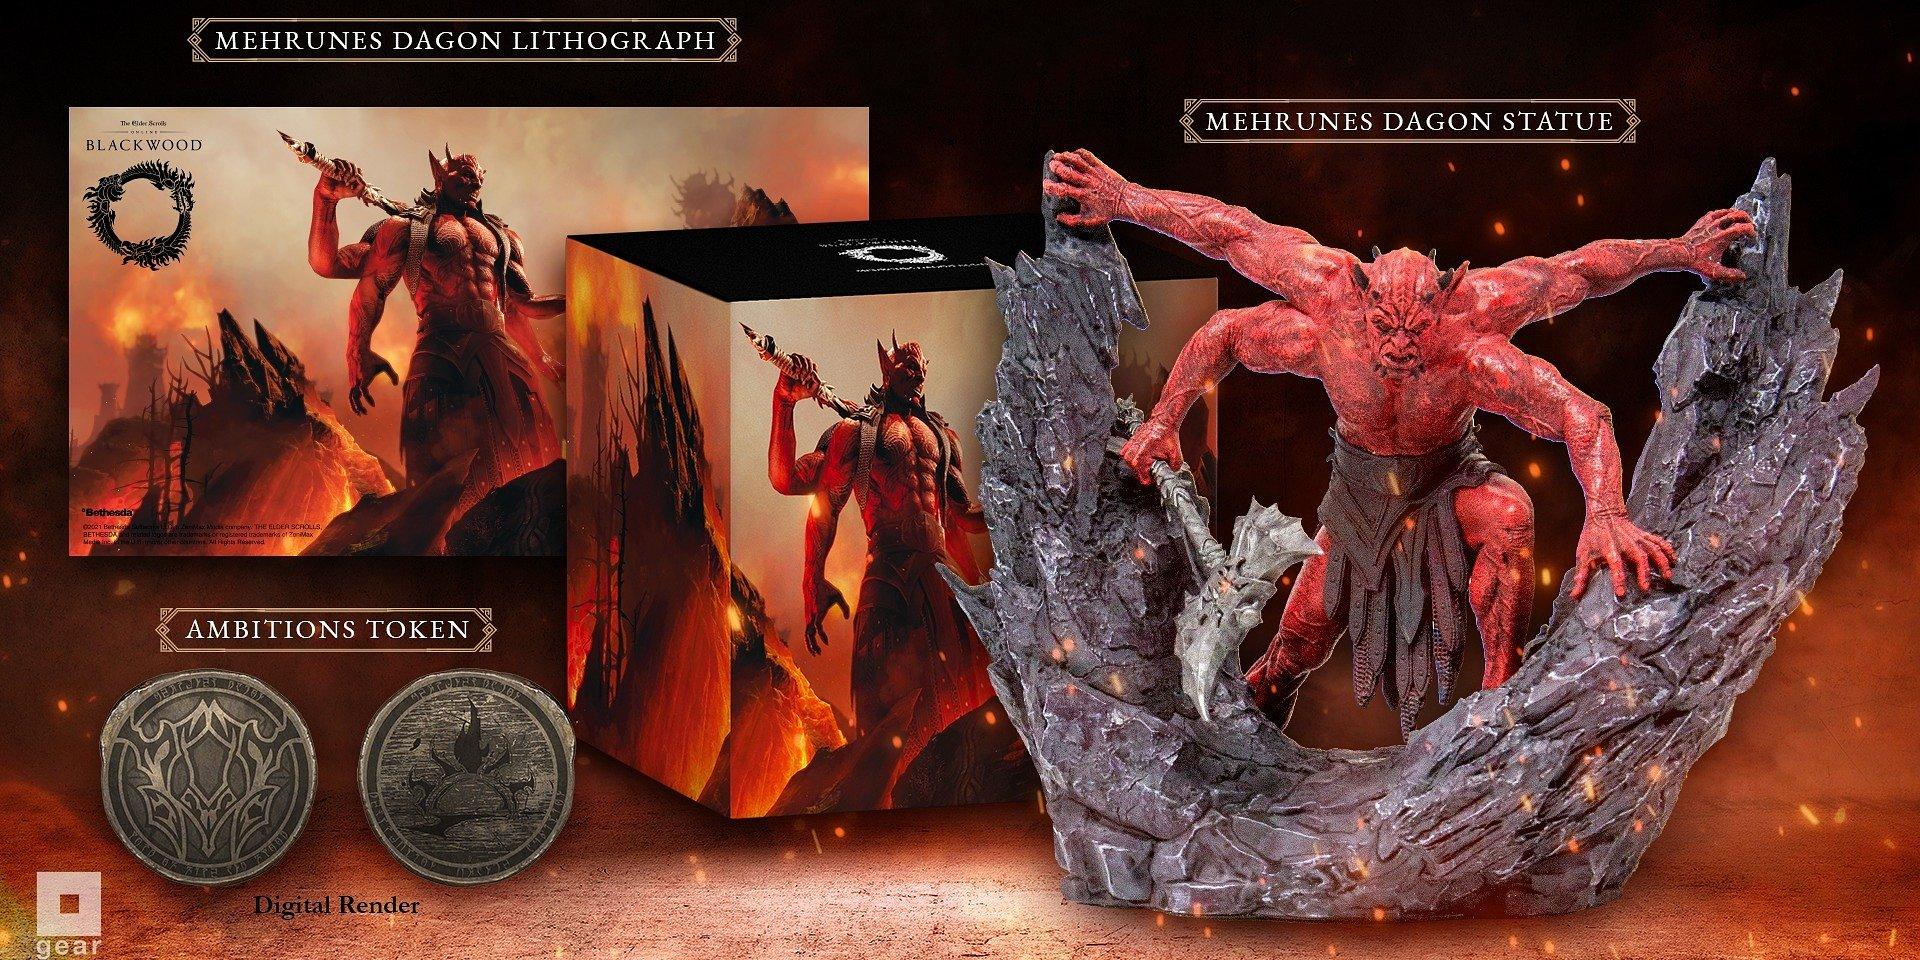 Elder Scrolls Online: Mehrunes Dagon Premuim Bundle Product Announcement